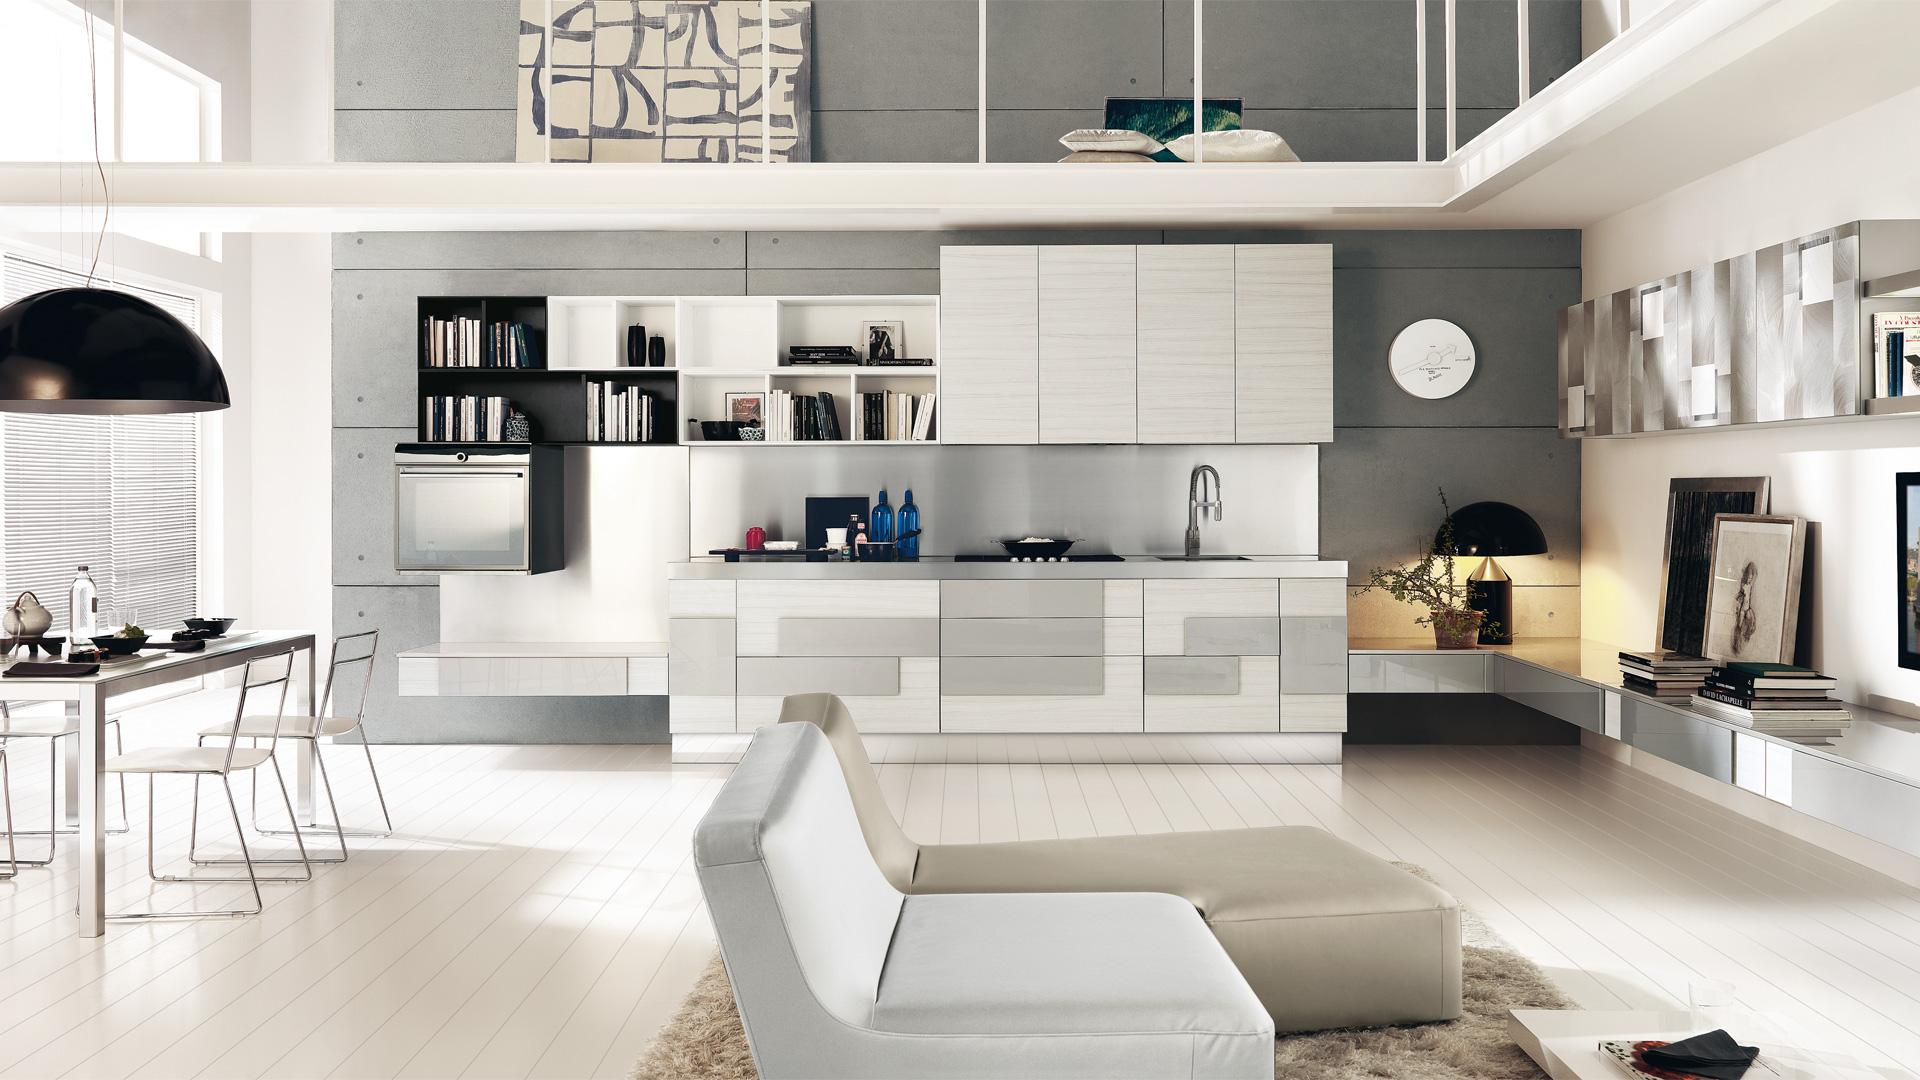 Cucina bianca 5 soluzioni per arredare proposti da lube for Cucina creativa